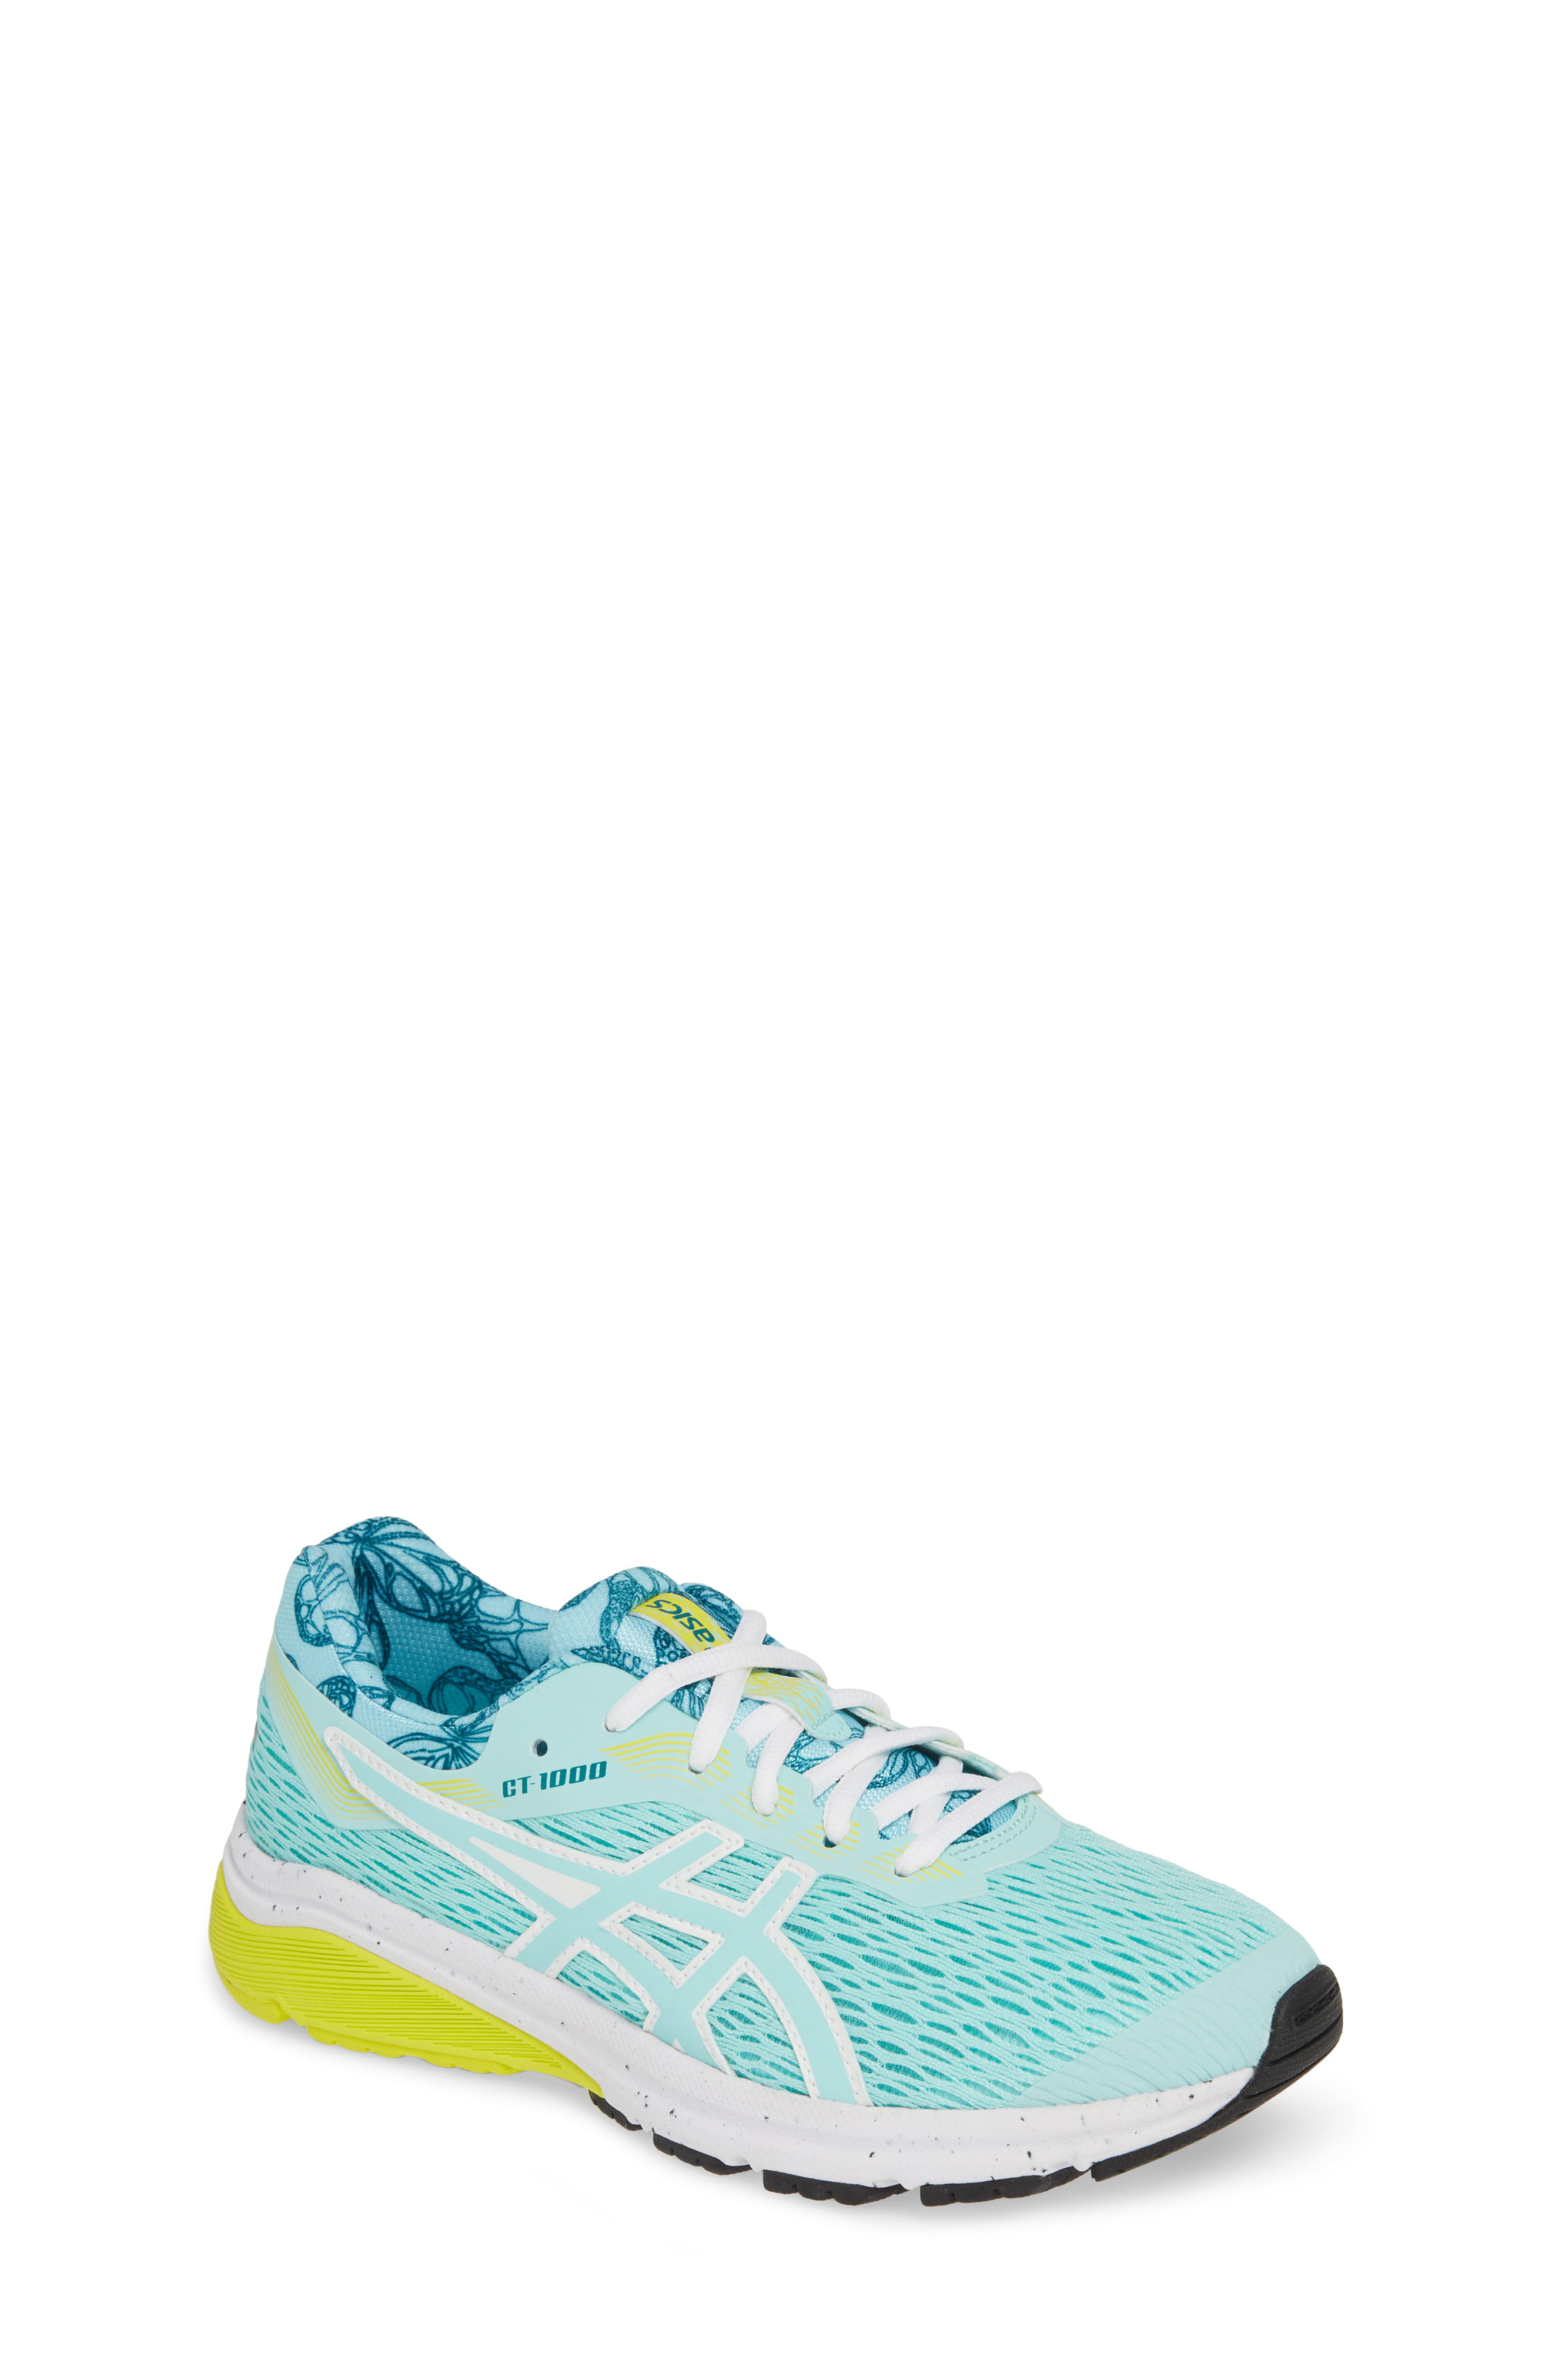 Asics Gel Cumulus Fluidride running shoes size 6.5 New